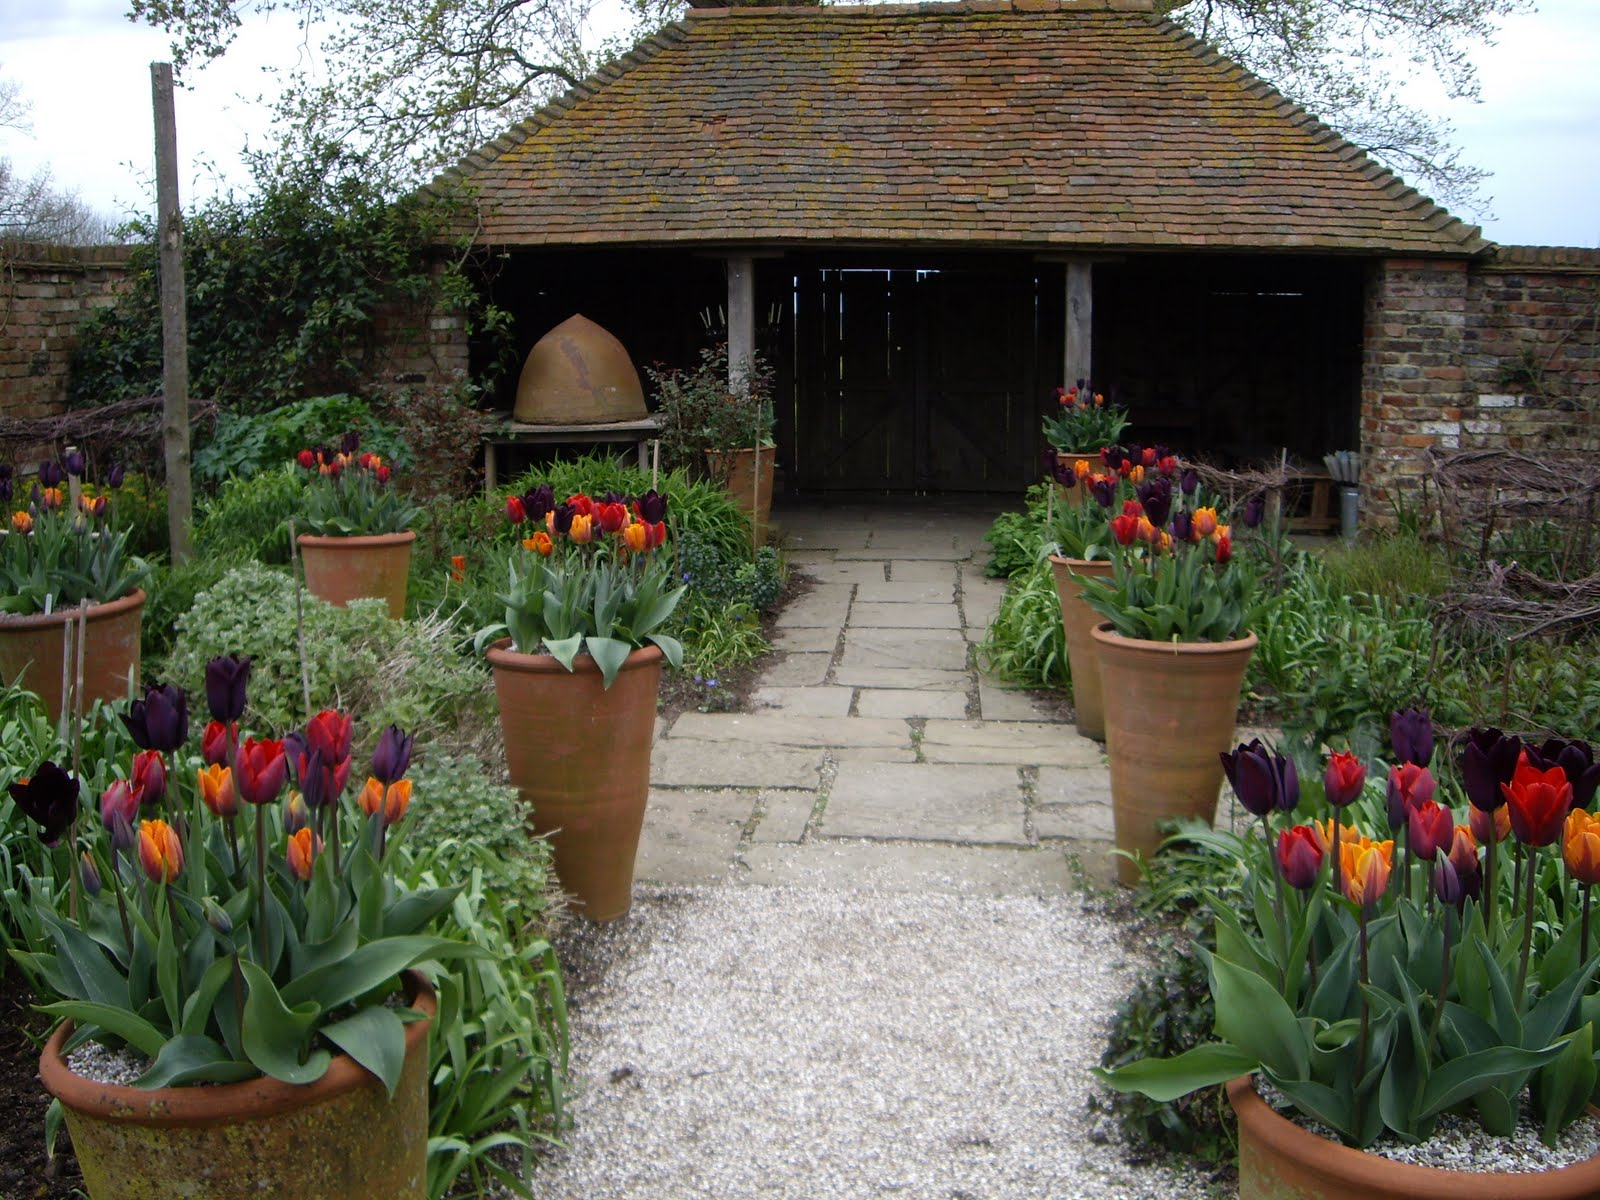 Pinterest the world s catalog of ideas for Spring hill nursery garden designs